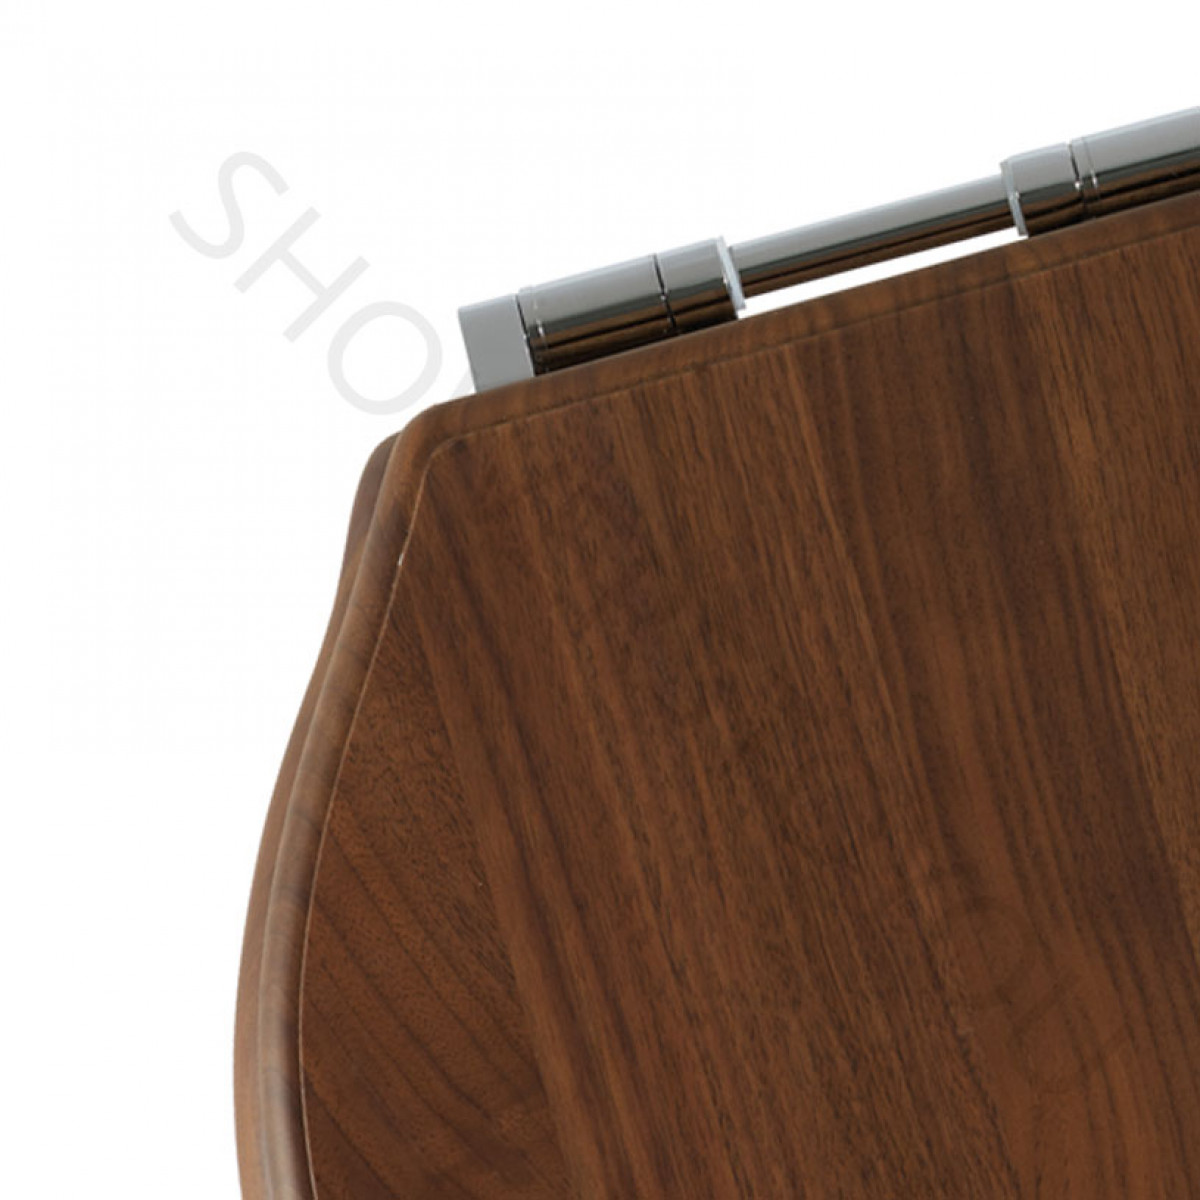 Roper Rhodes Greenwich Solid Wood Walnut Soft Close Toilet